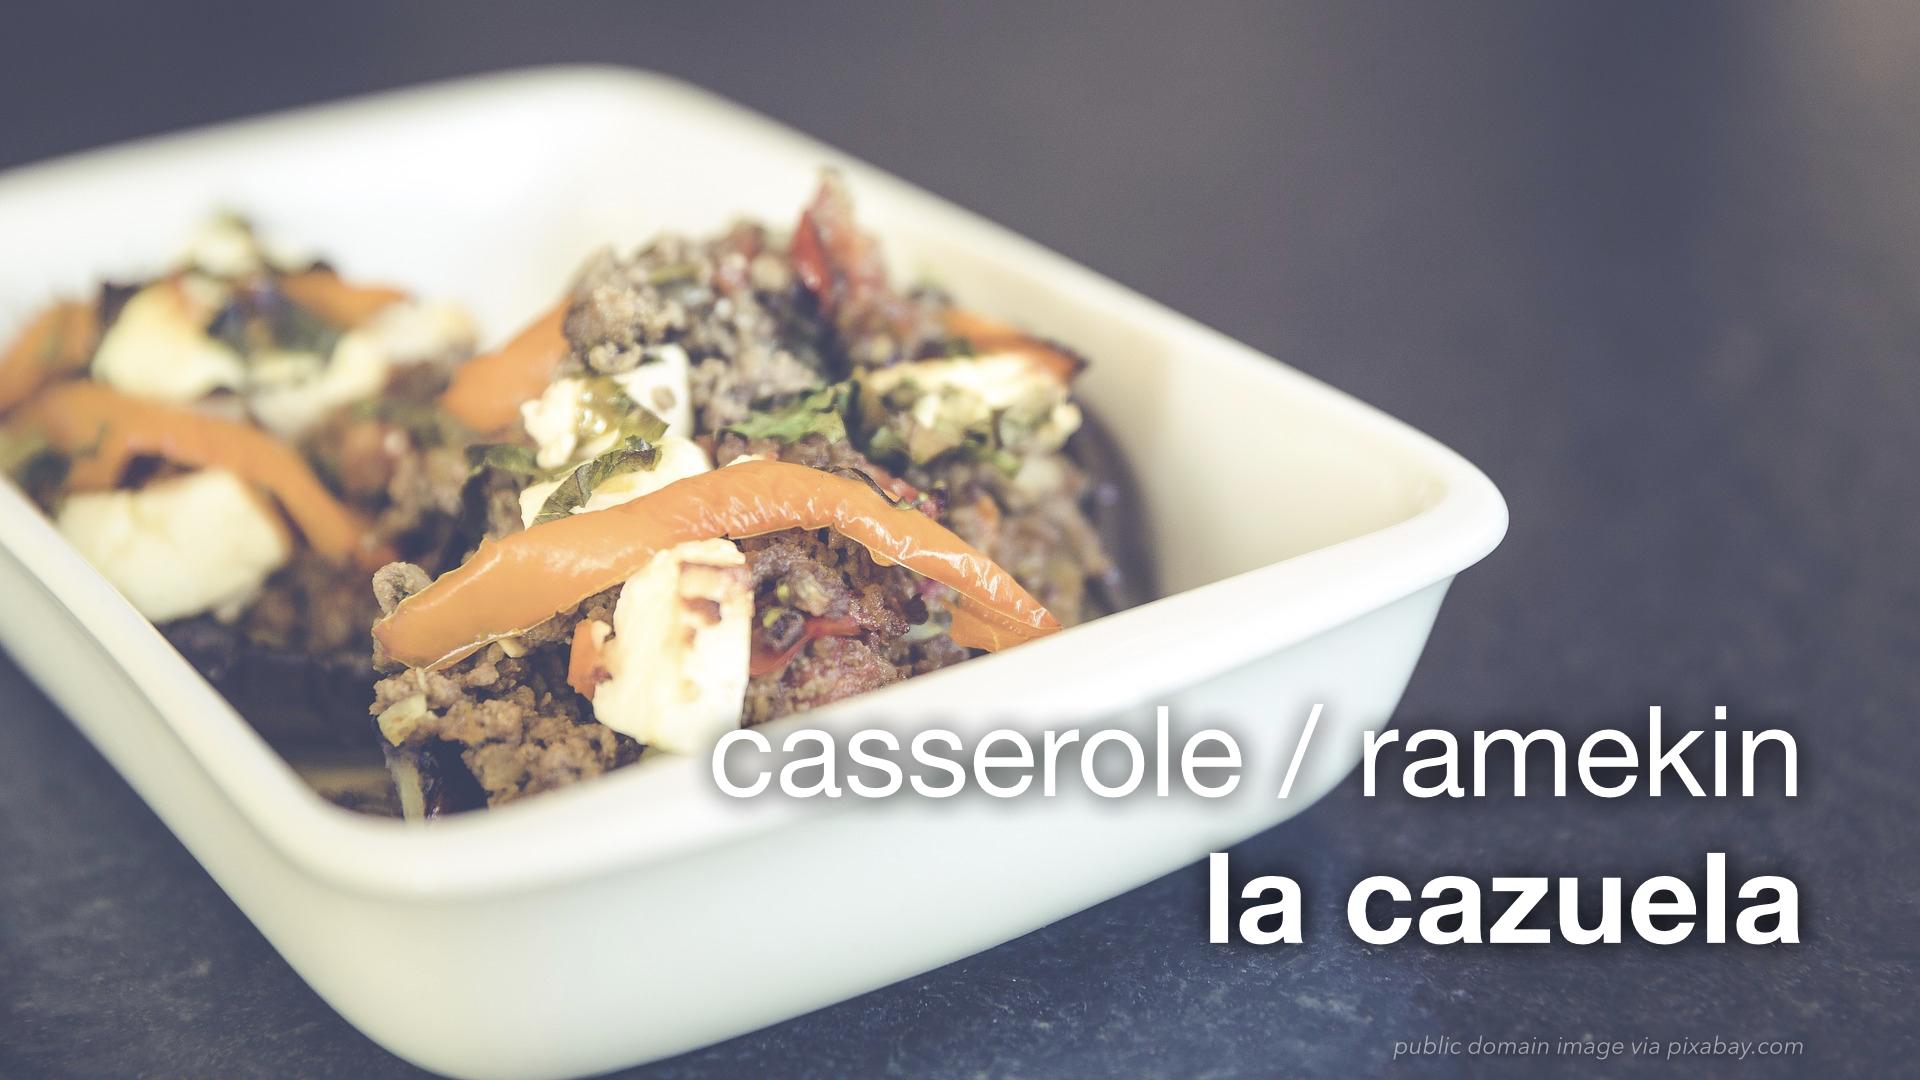 leaf spanish flash – hospitality – utensils and place settings.002